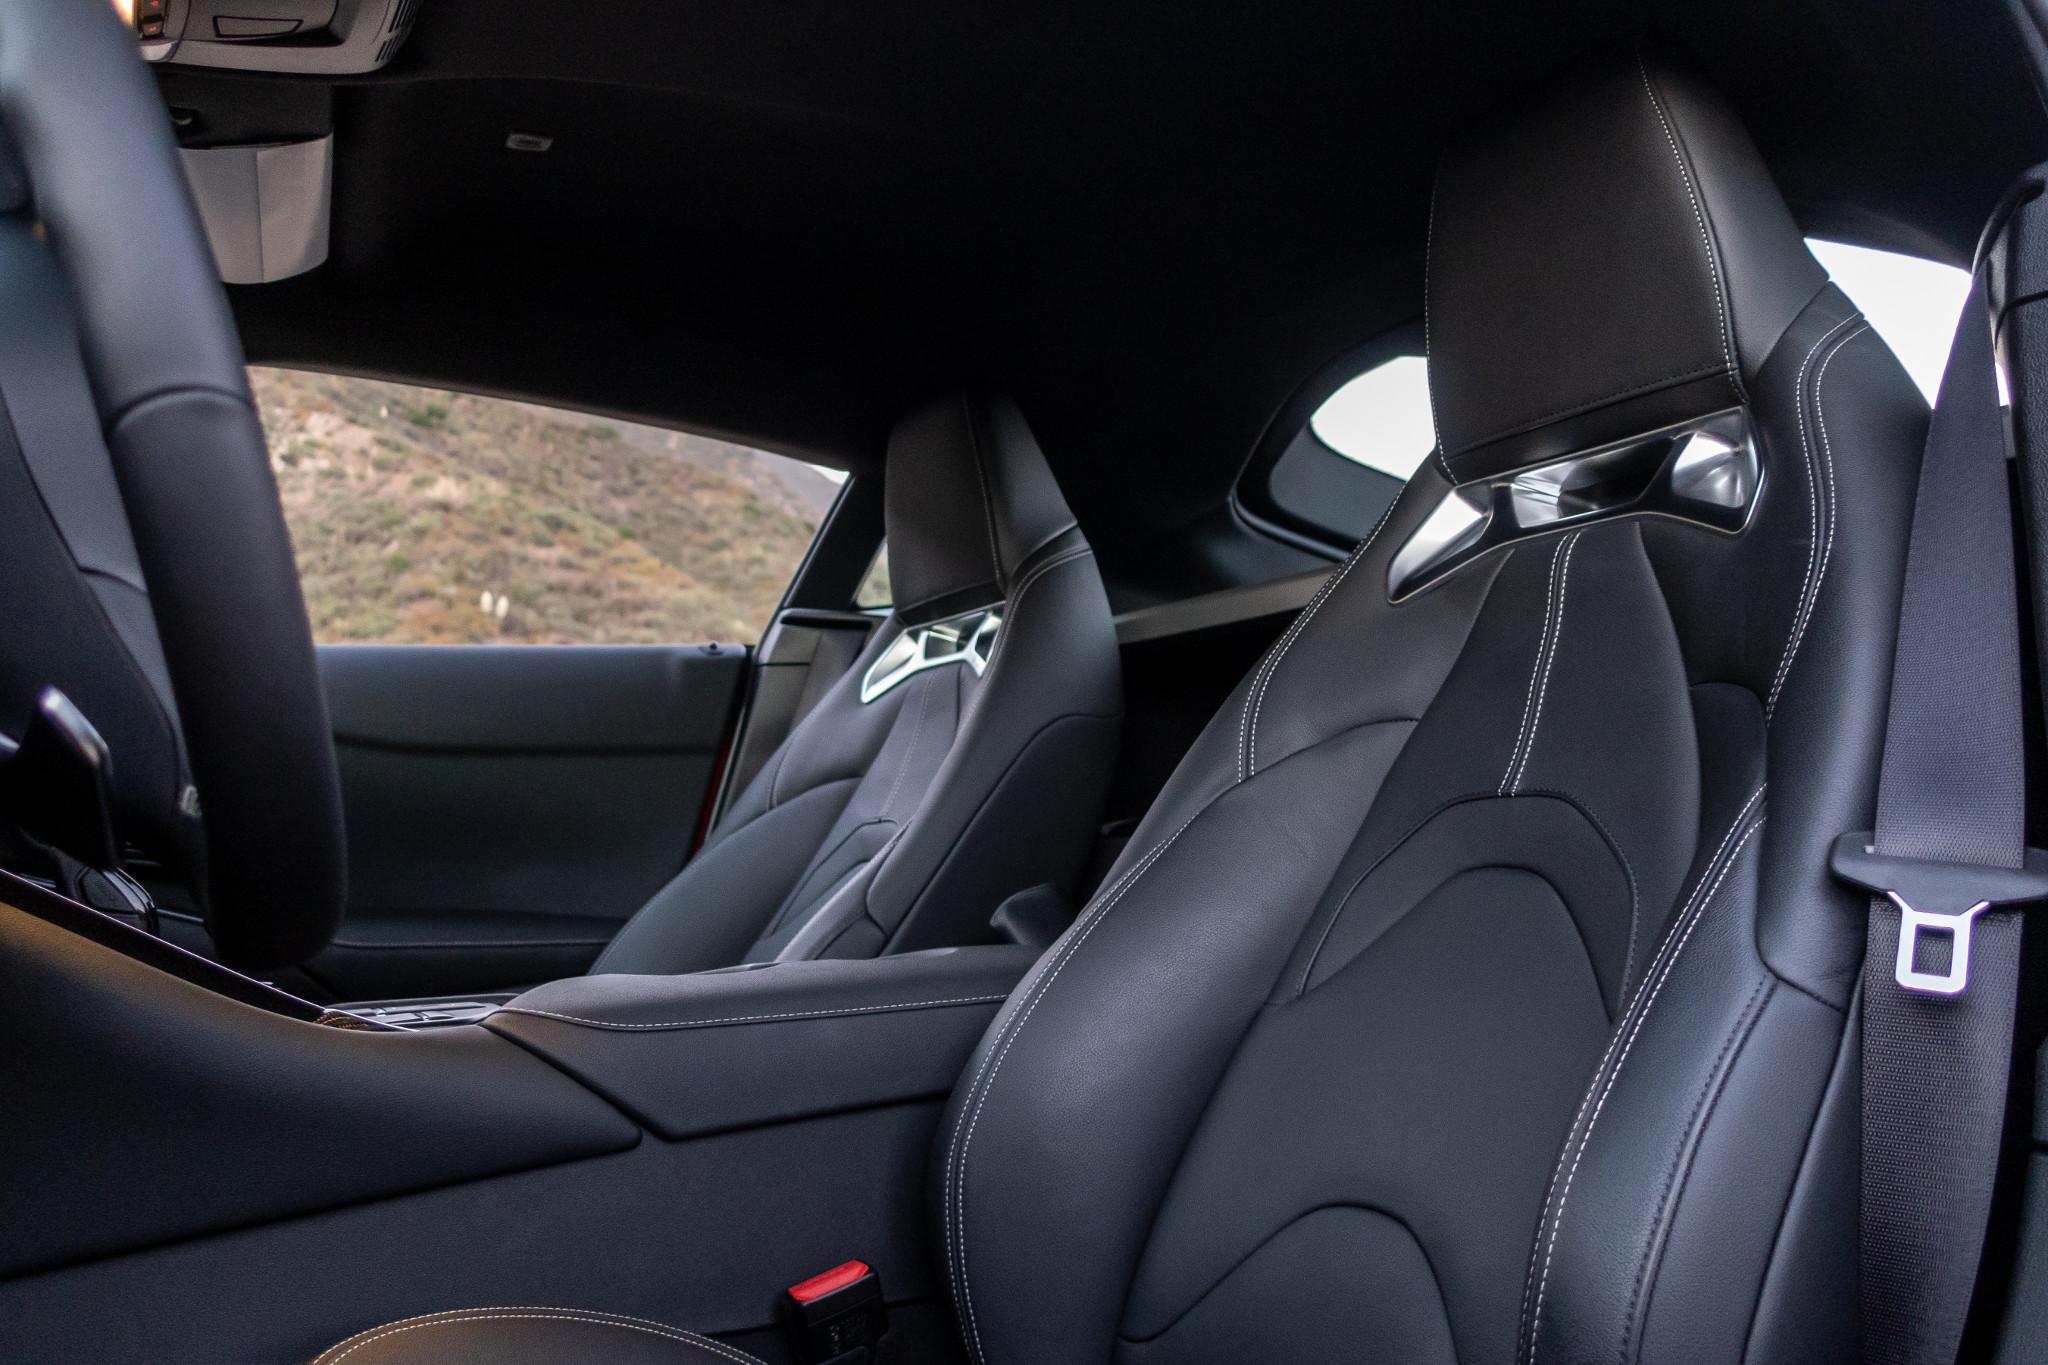 toyota-supra-2020-18-front-row--interior--seat.jpg